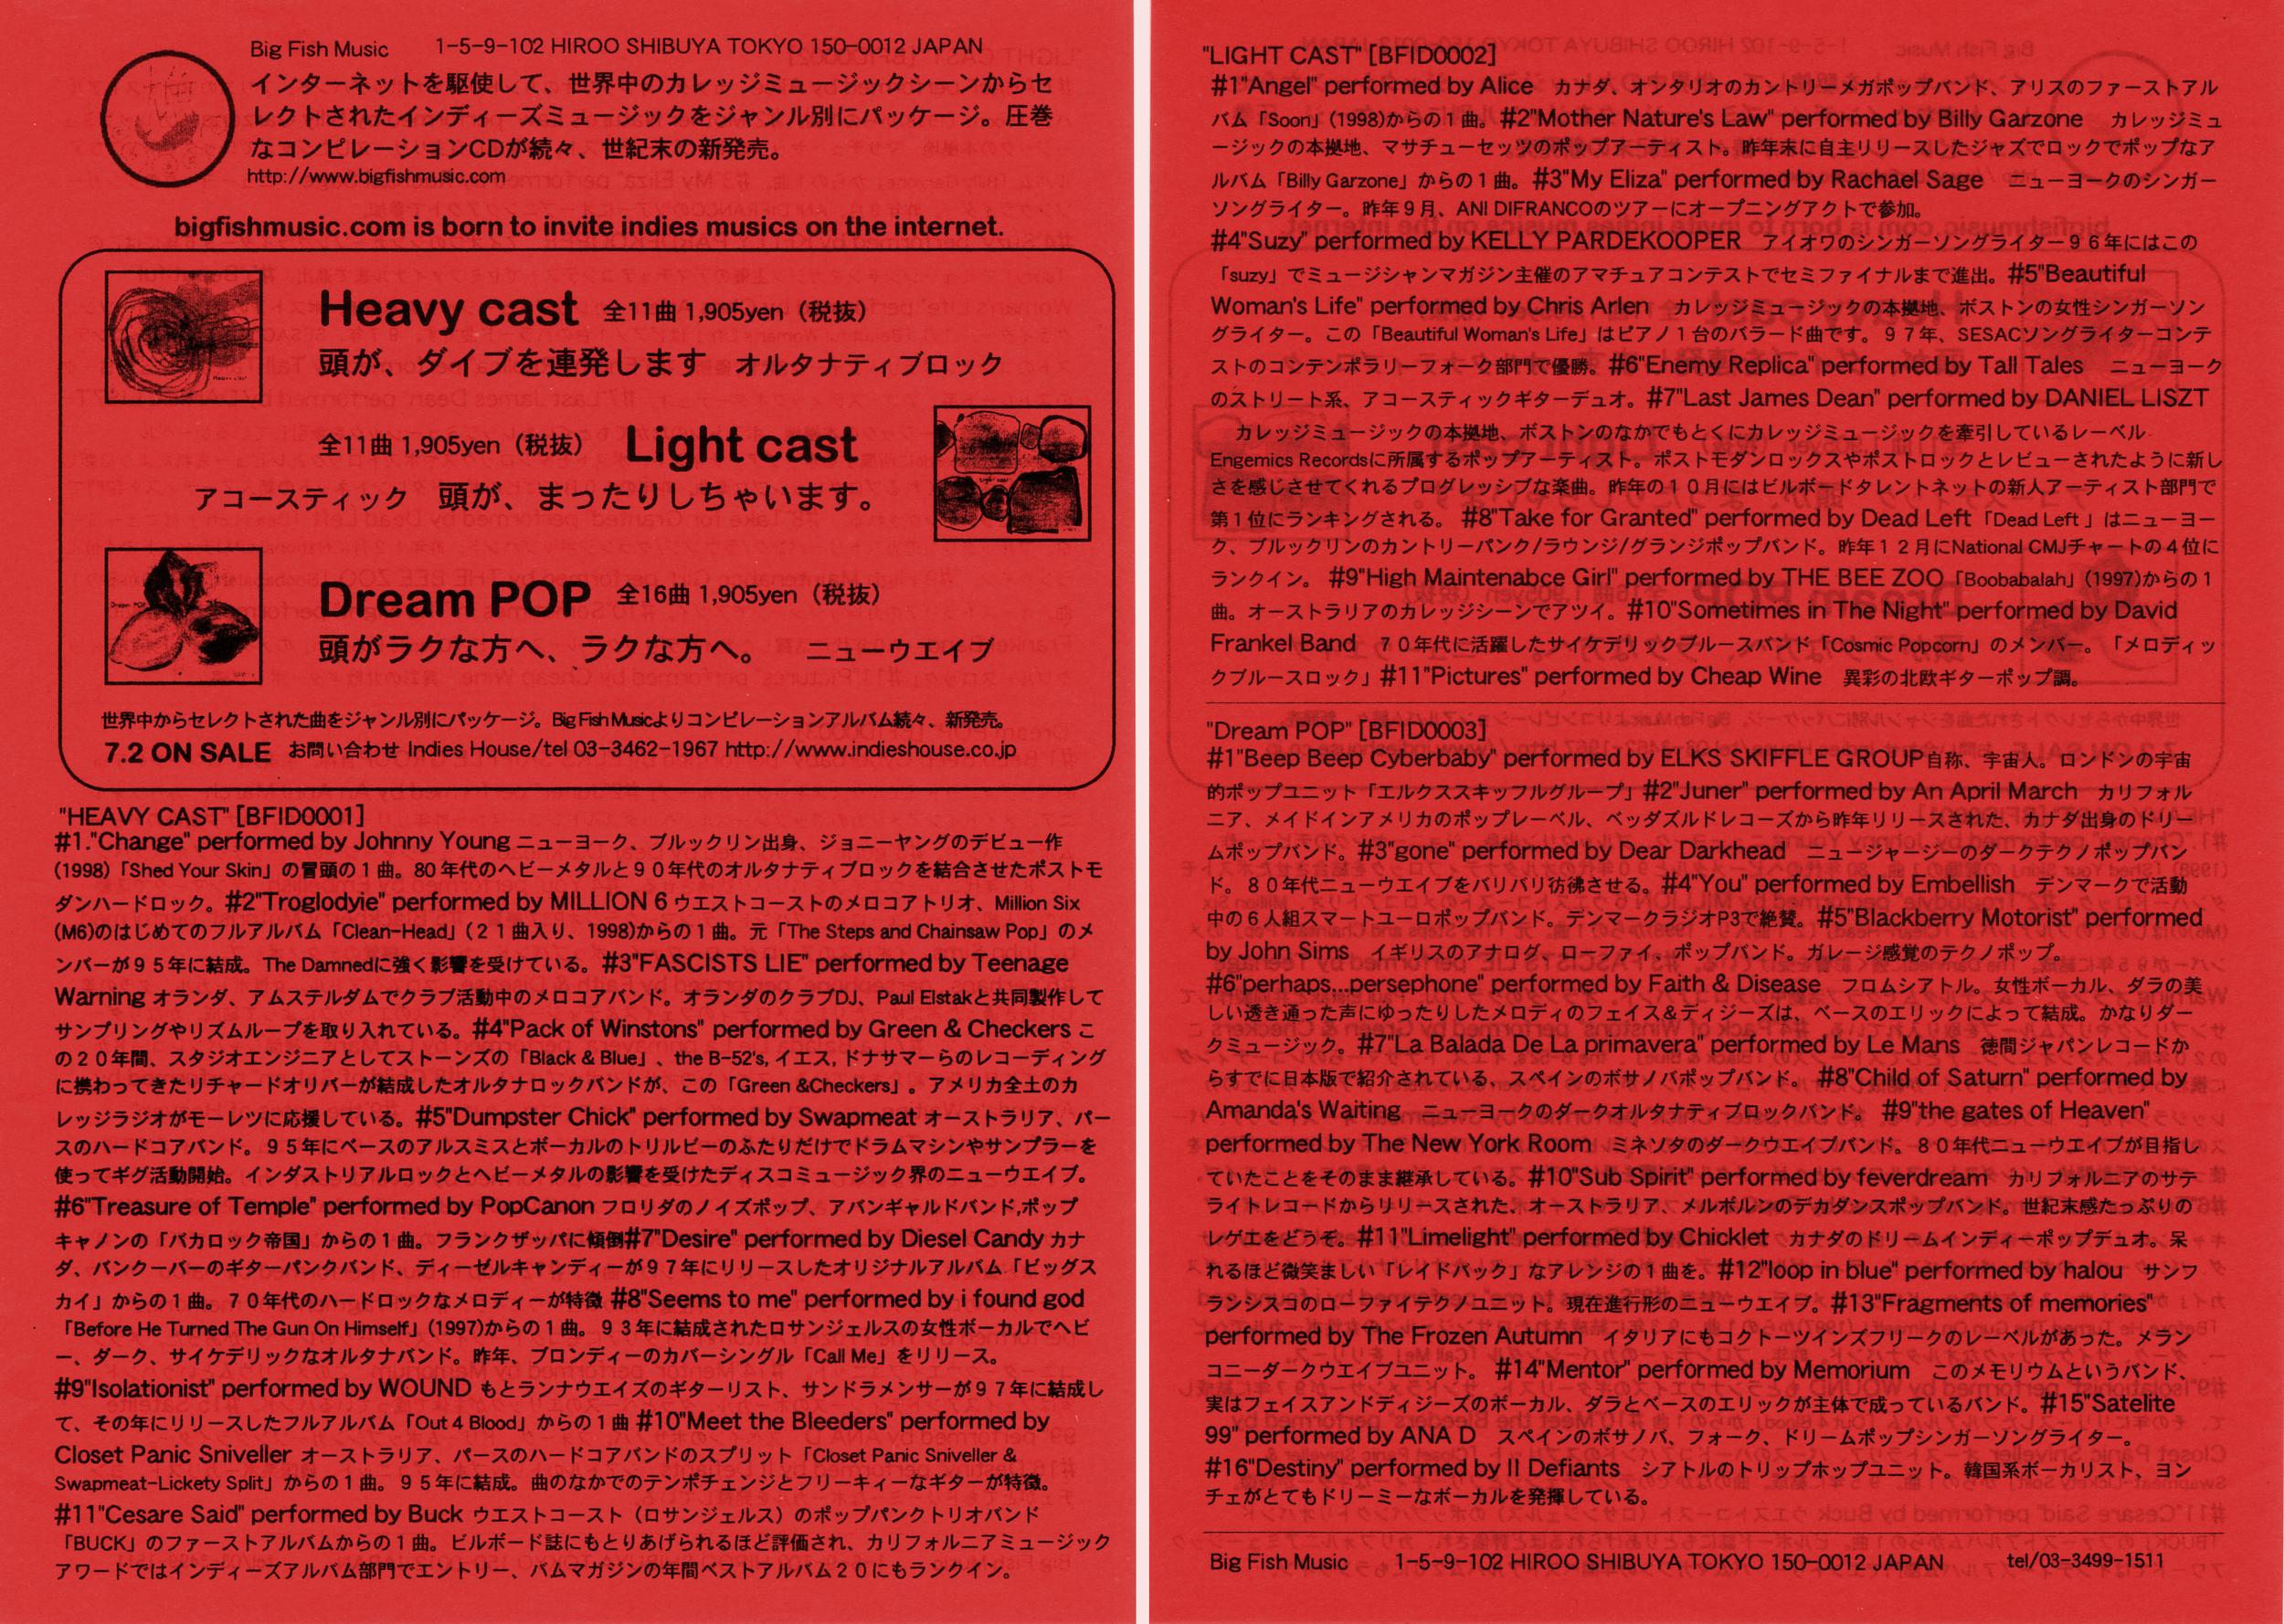 Dreampop CD compilation poster, Big Fish Music, Japan 1999